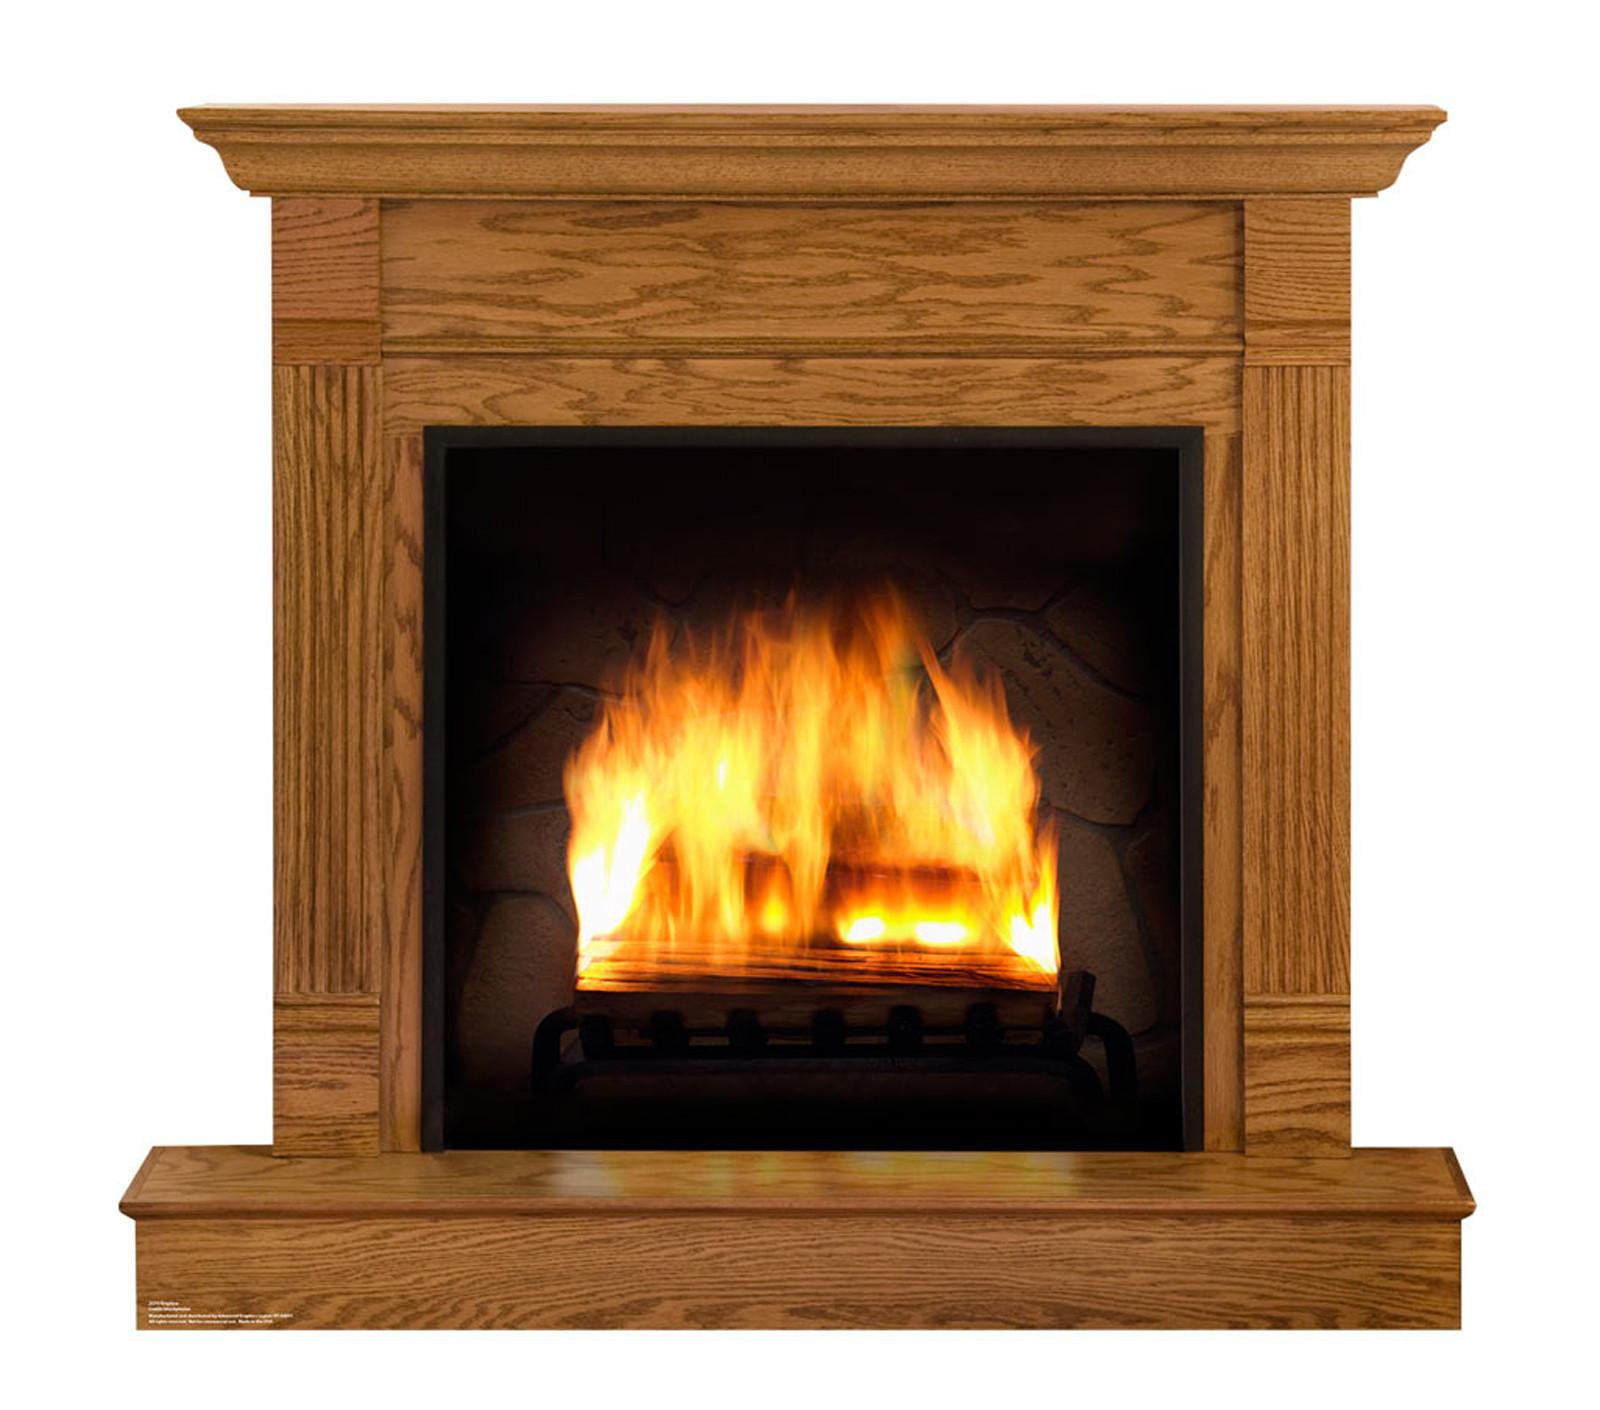 Christmas Cardboard Fireplace  Fake Fireplace Life Size Cardboard Cutout Standup